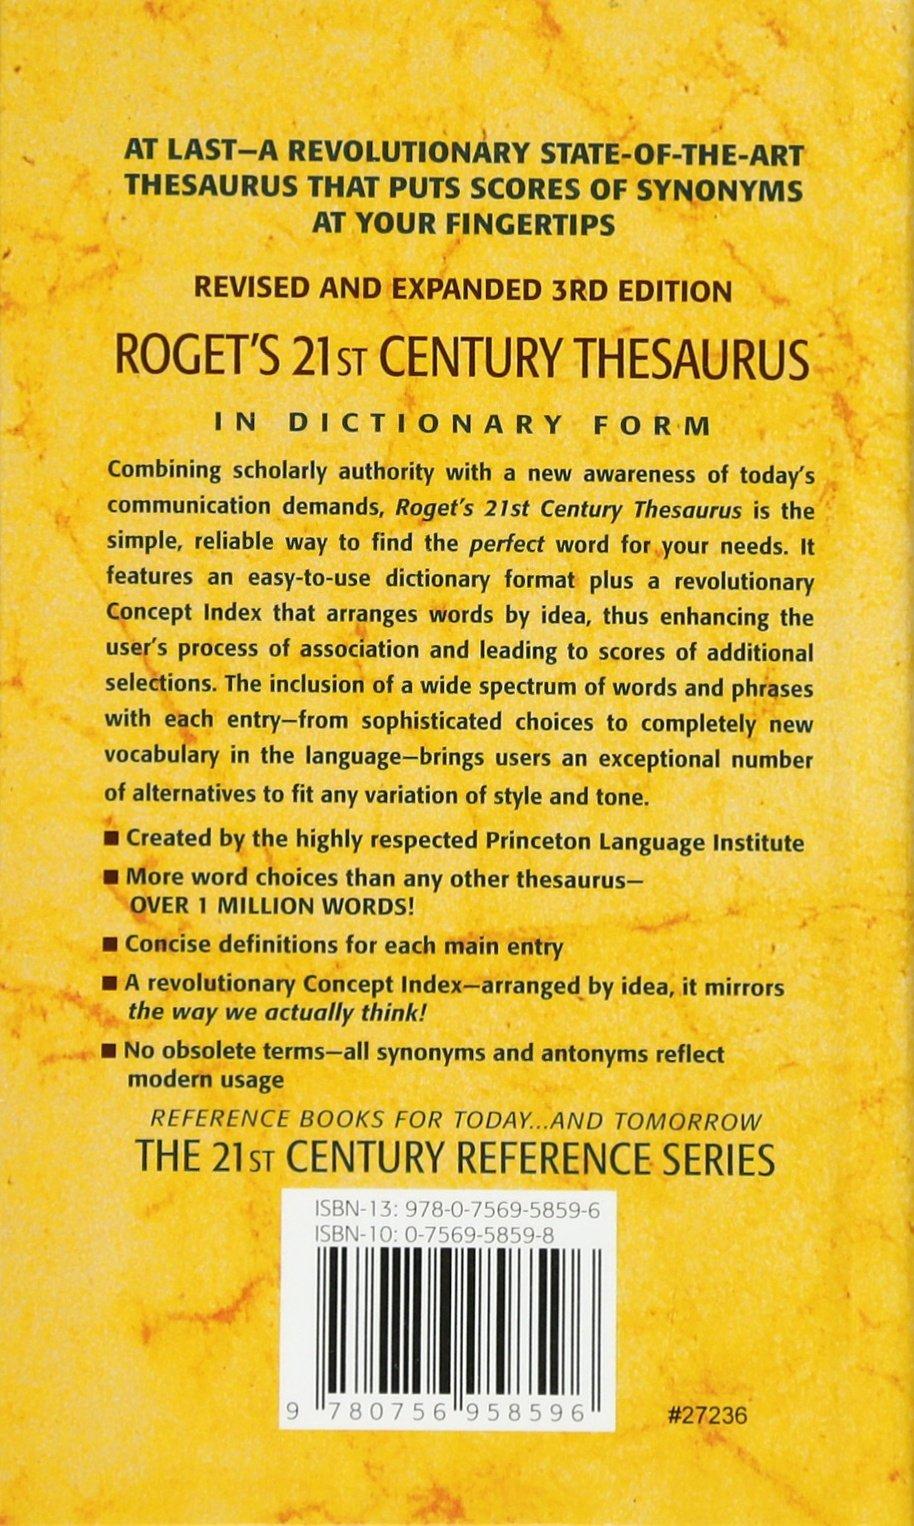 Rogets 21st century thesaurus 21st century reference pb rogets 21st century thesaurus 21st century reference pb barbara ann kipfer phd 9780756958596 amazon books m4hsunfo